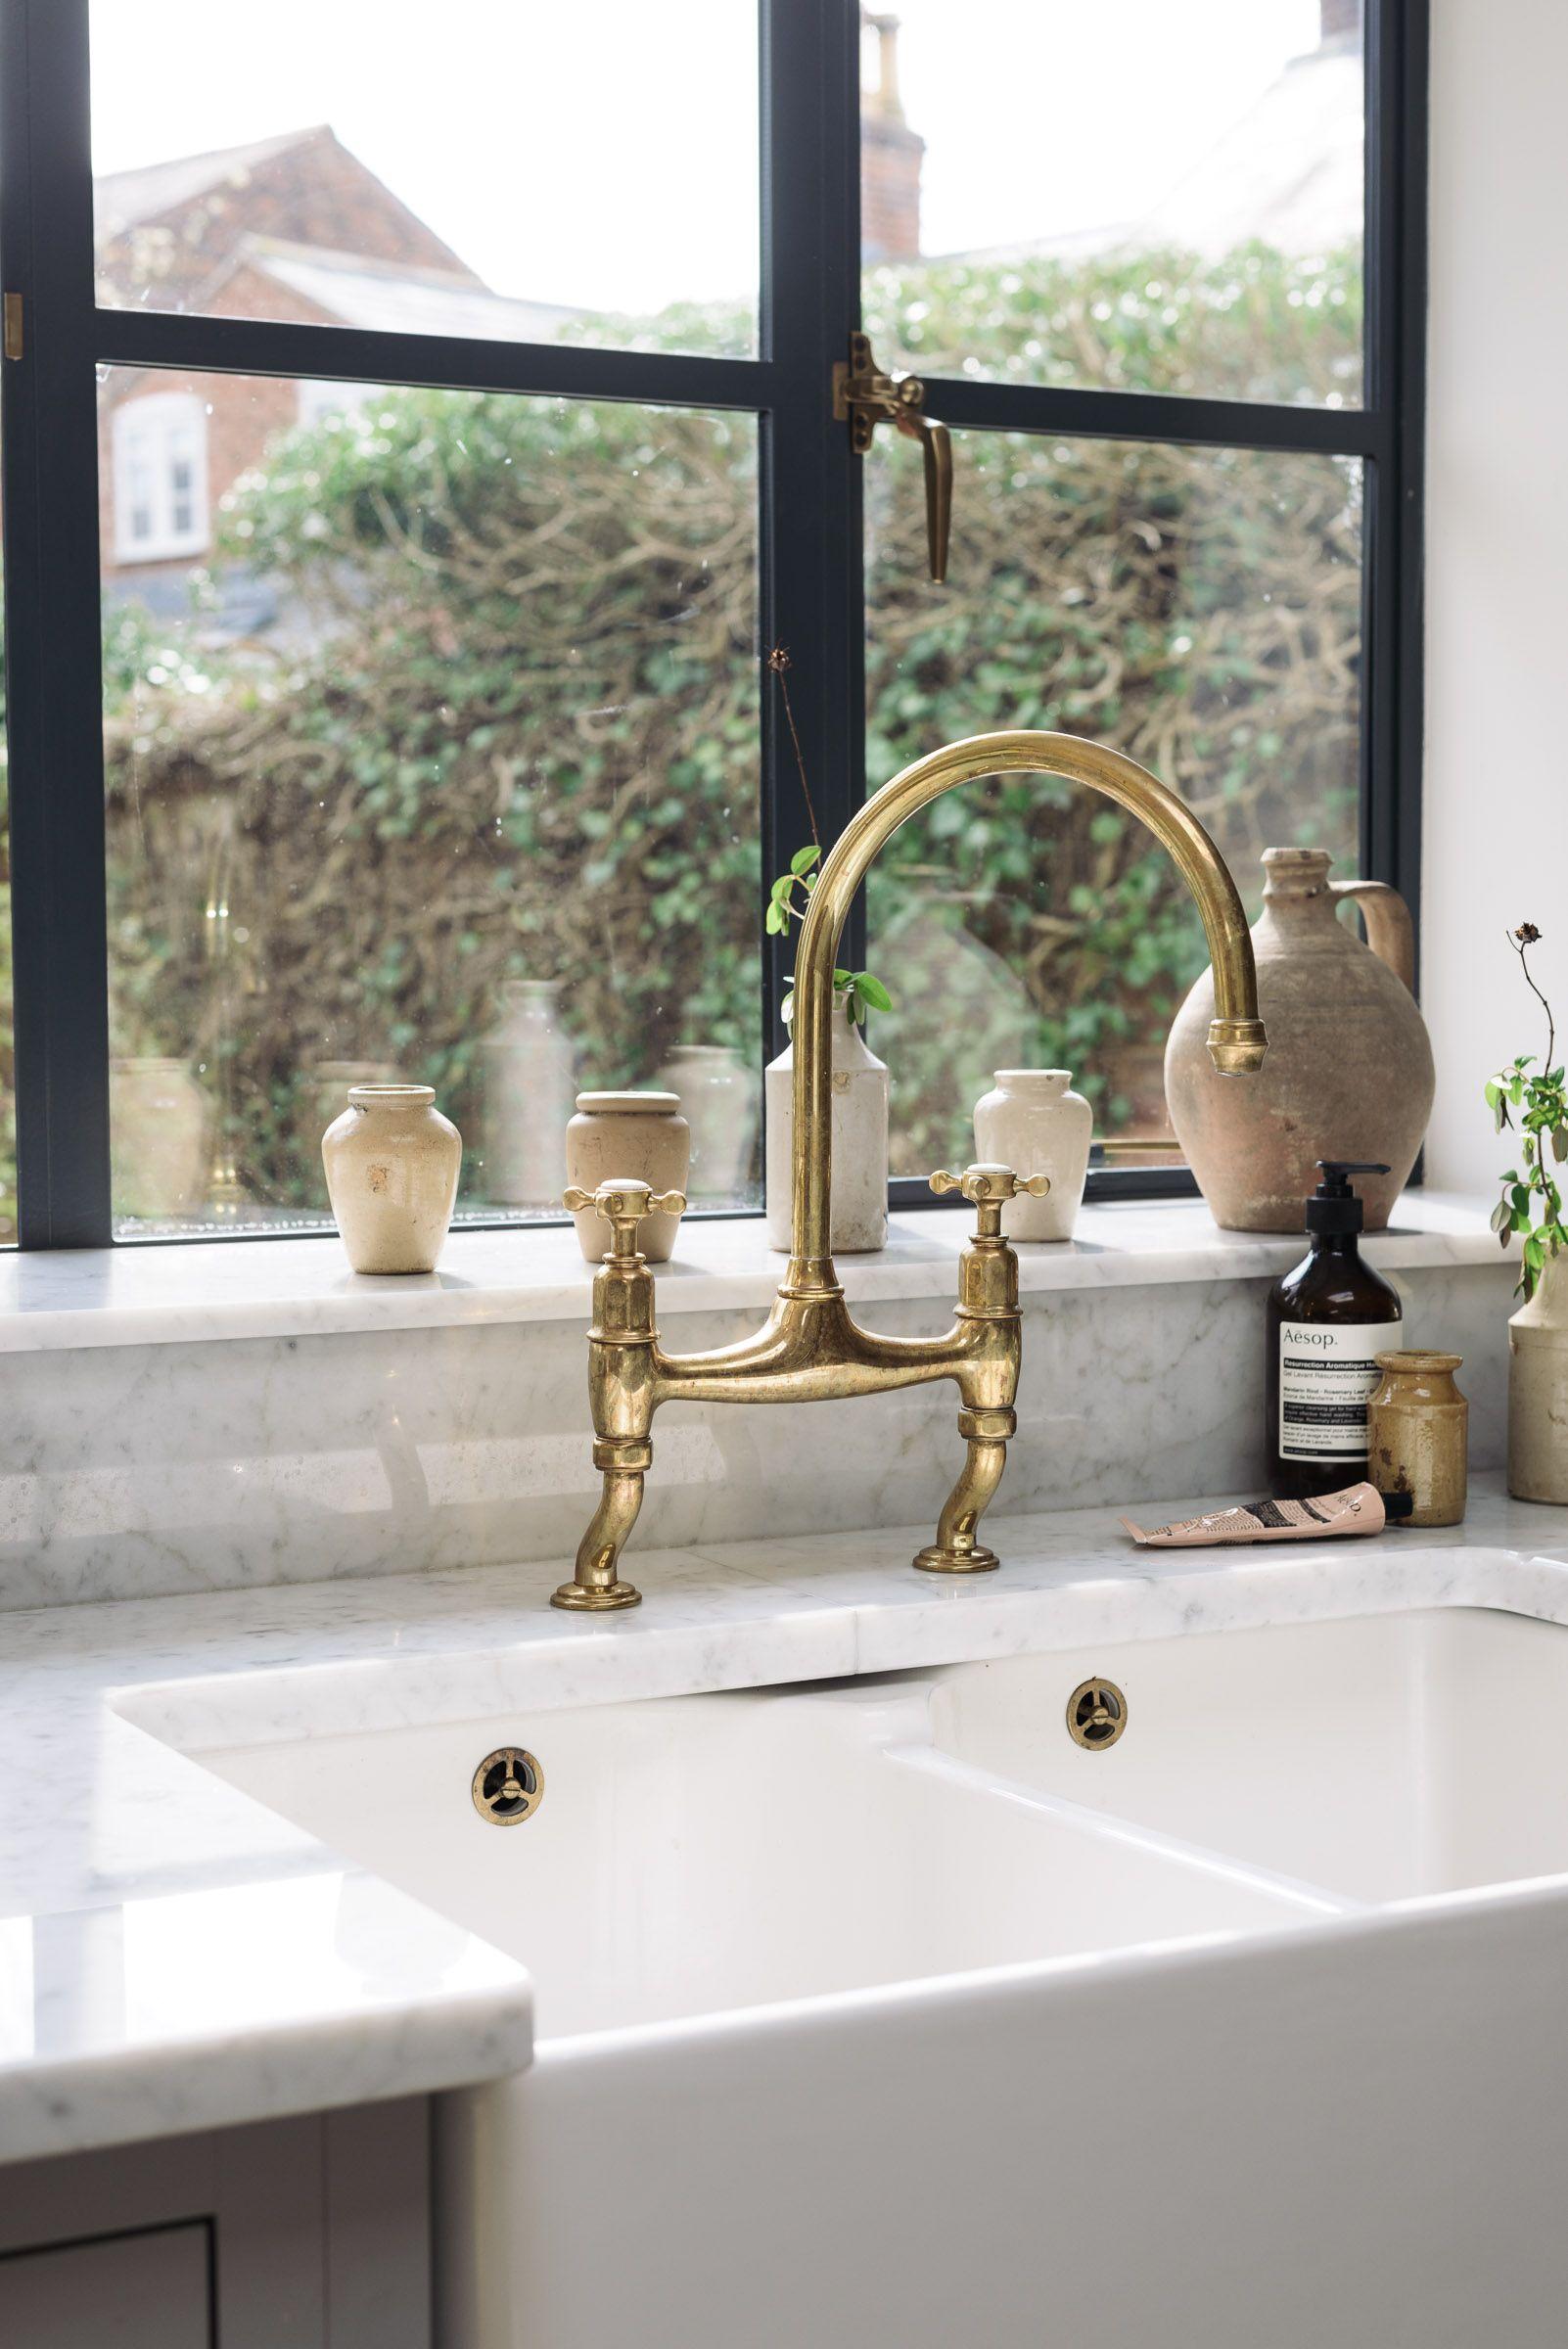 aged single image brass of faucet bathroom fixtures kohler antique